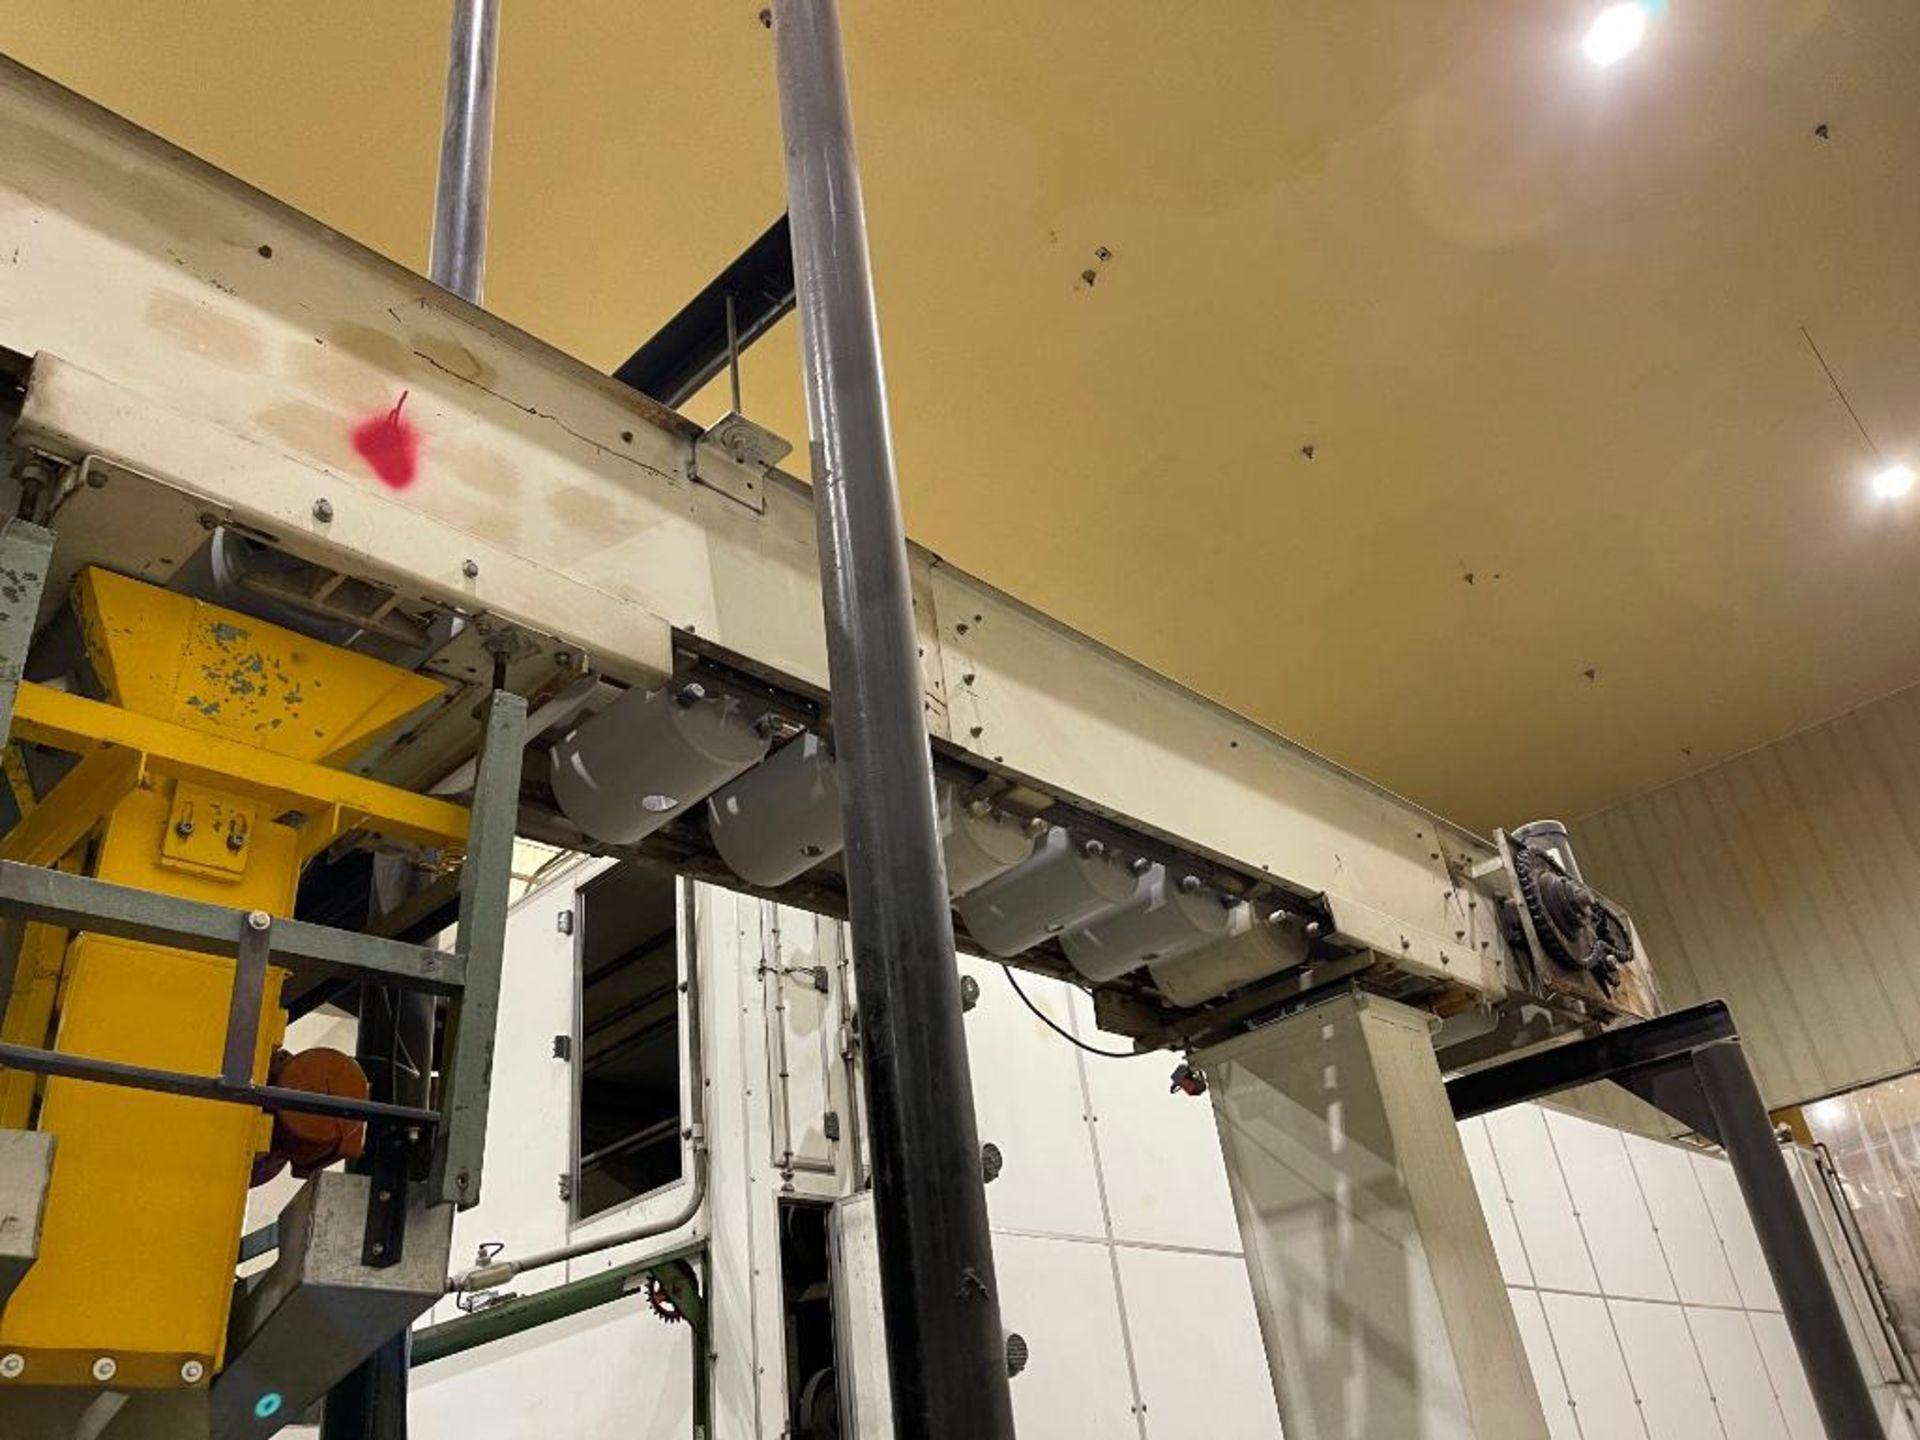 Meyer horizontal bucket elevator, model PQ-172-12-BCS - Image 9 of 19